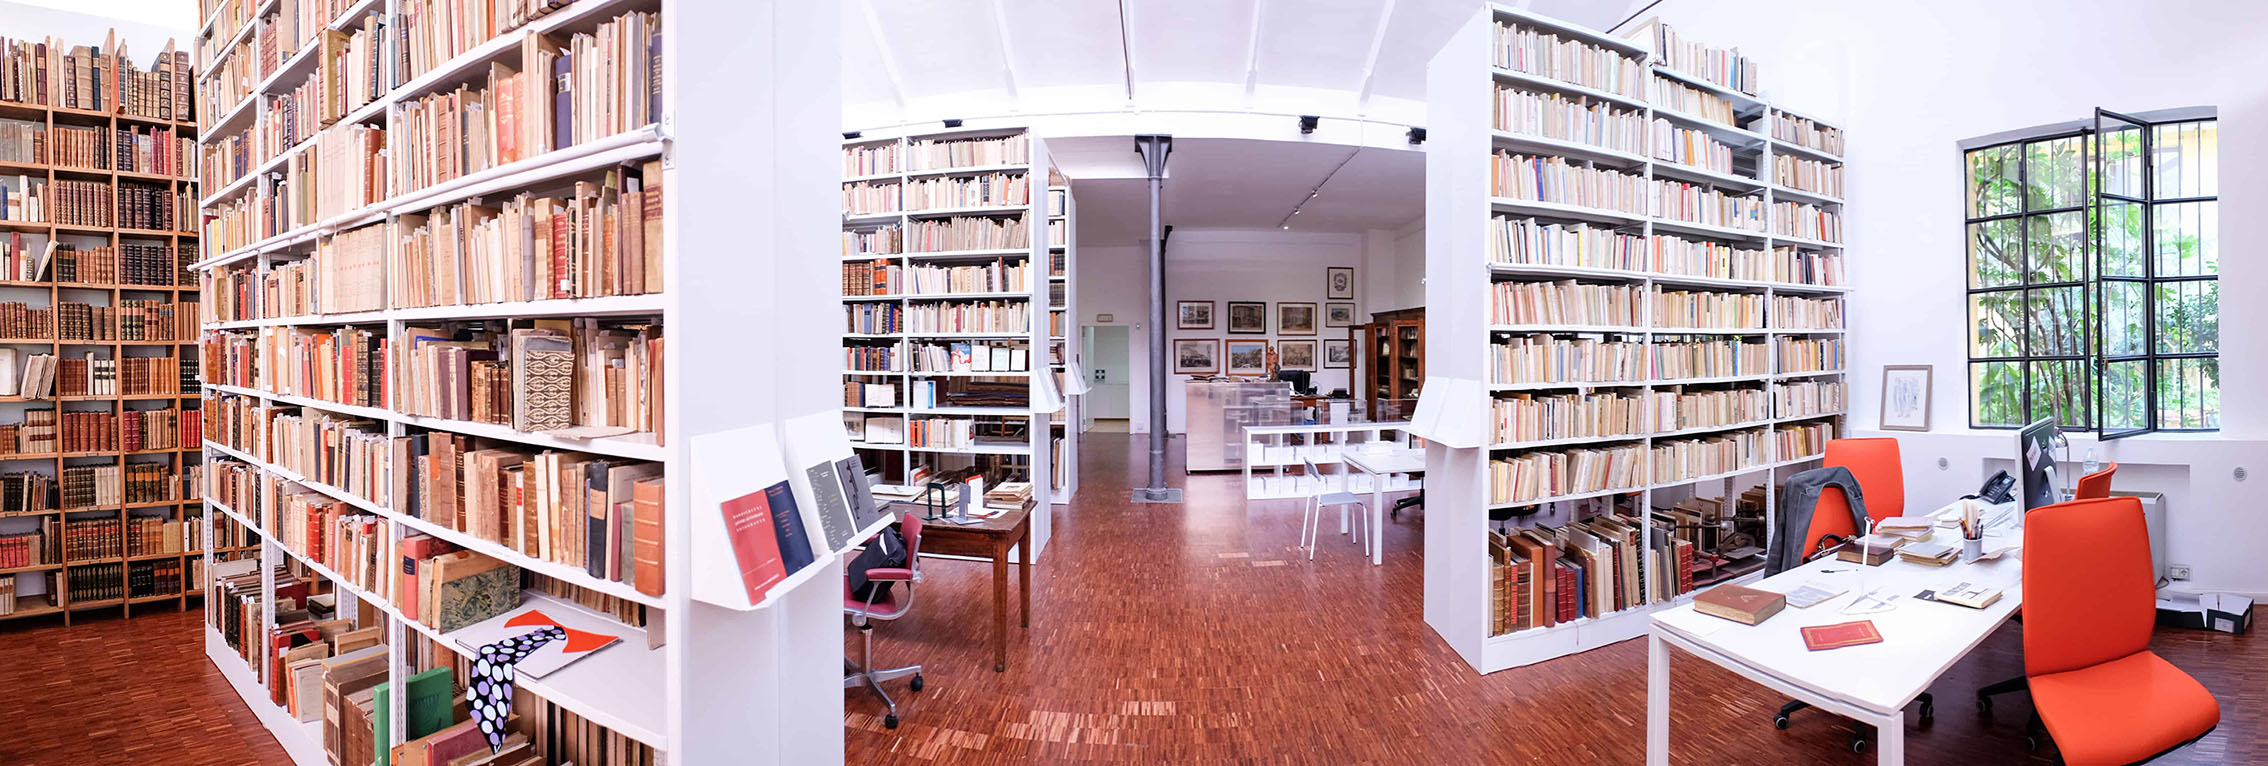 Libreria Pontremoli